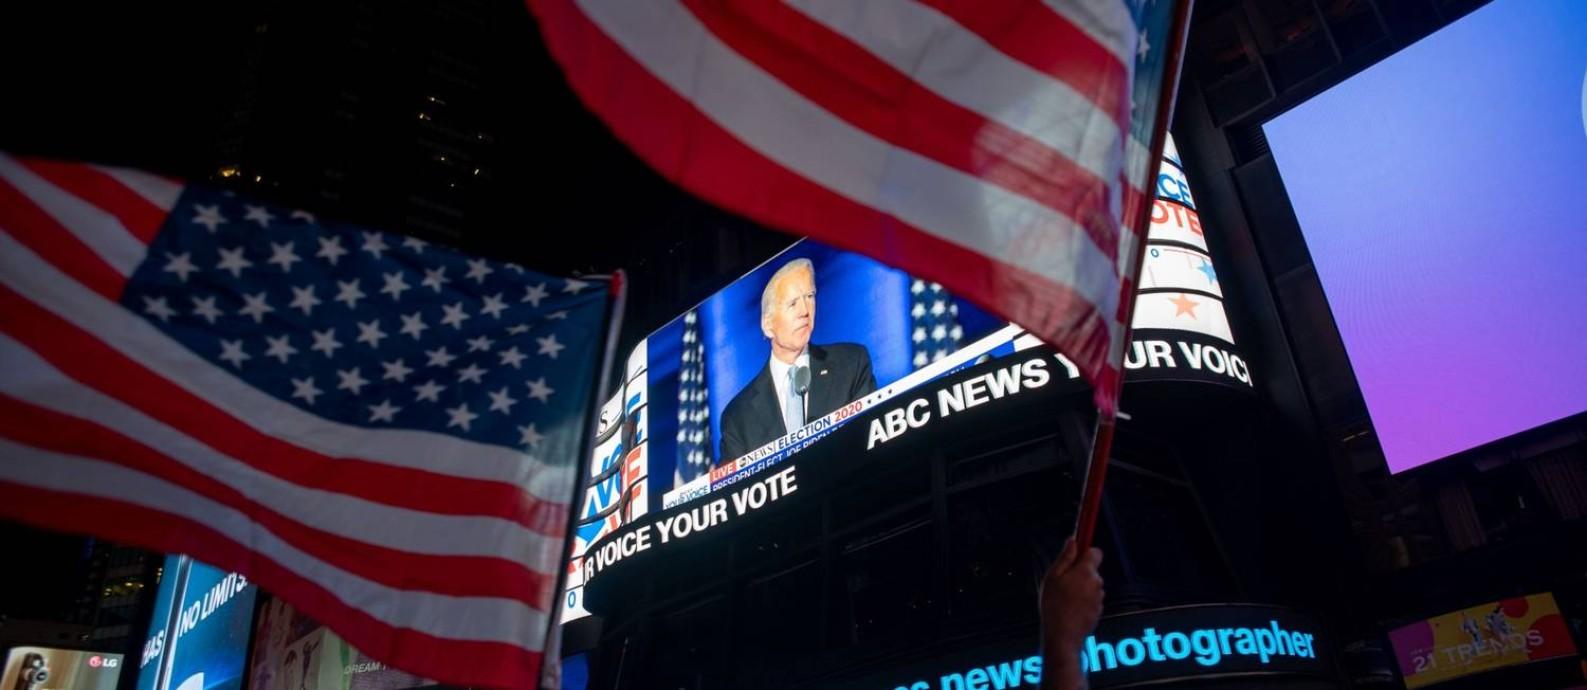 Vitória de Joe Biden impulsiona as bolsas na Ásia e na Europa nesta segunda-feira Foto: Amir Hamja / Bloomberg